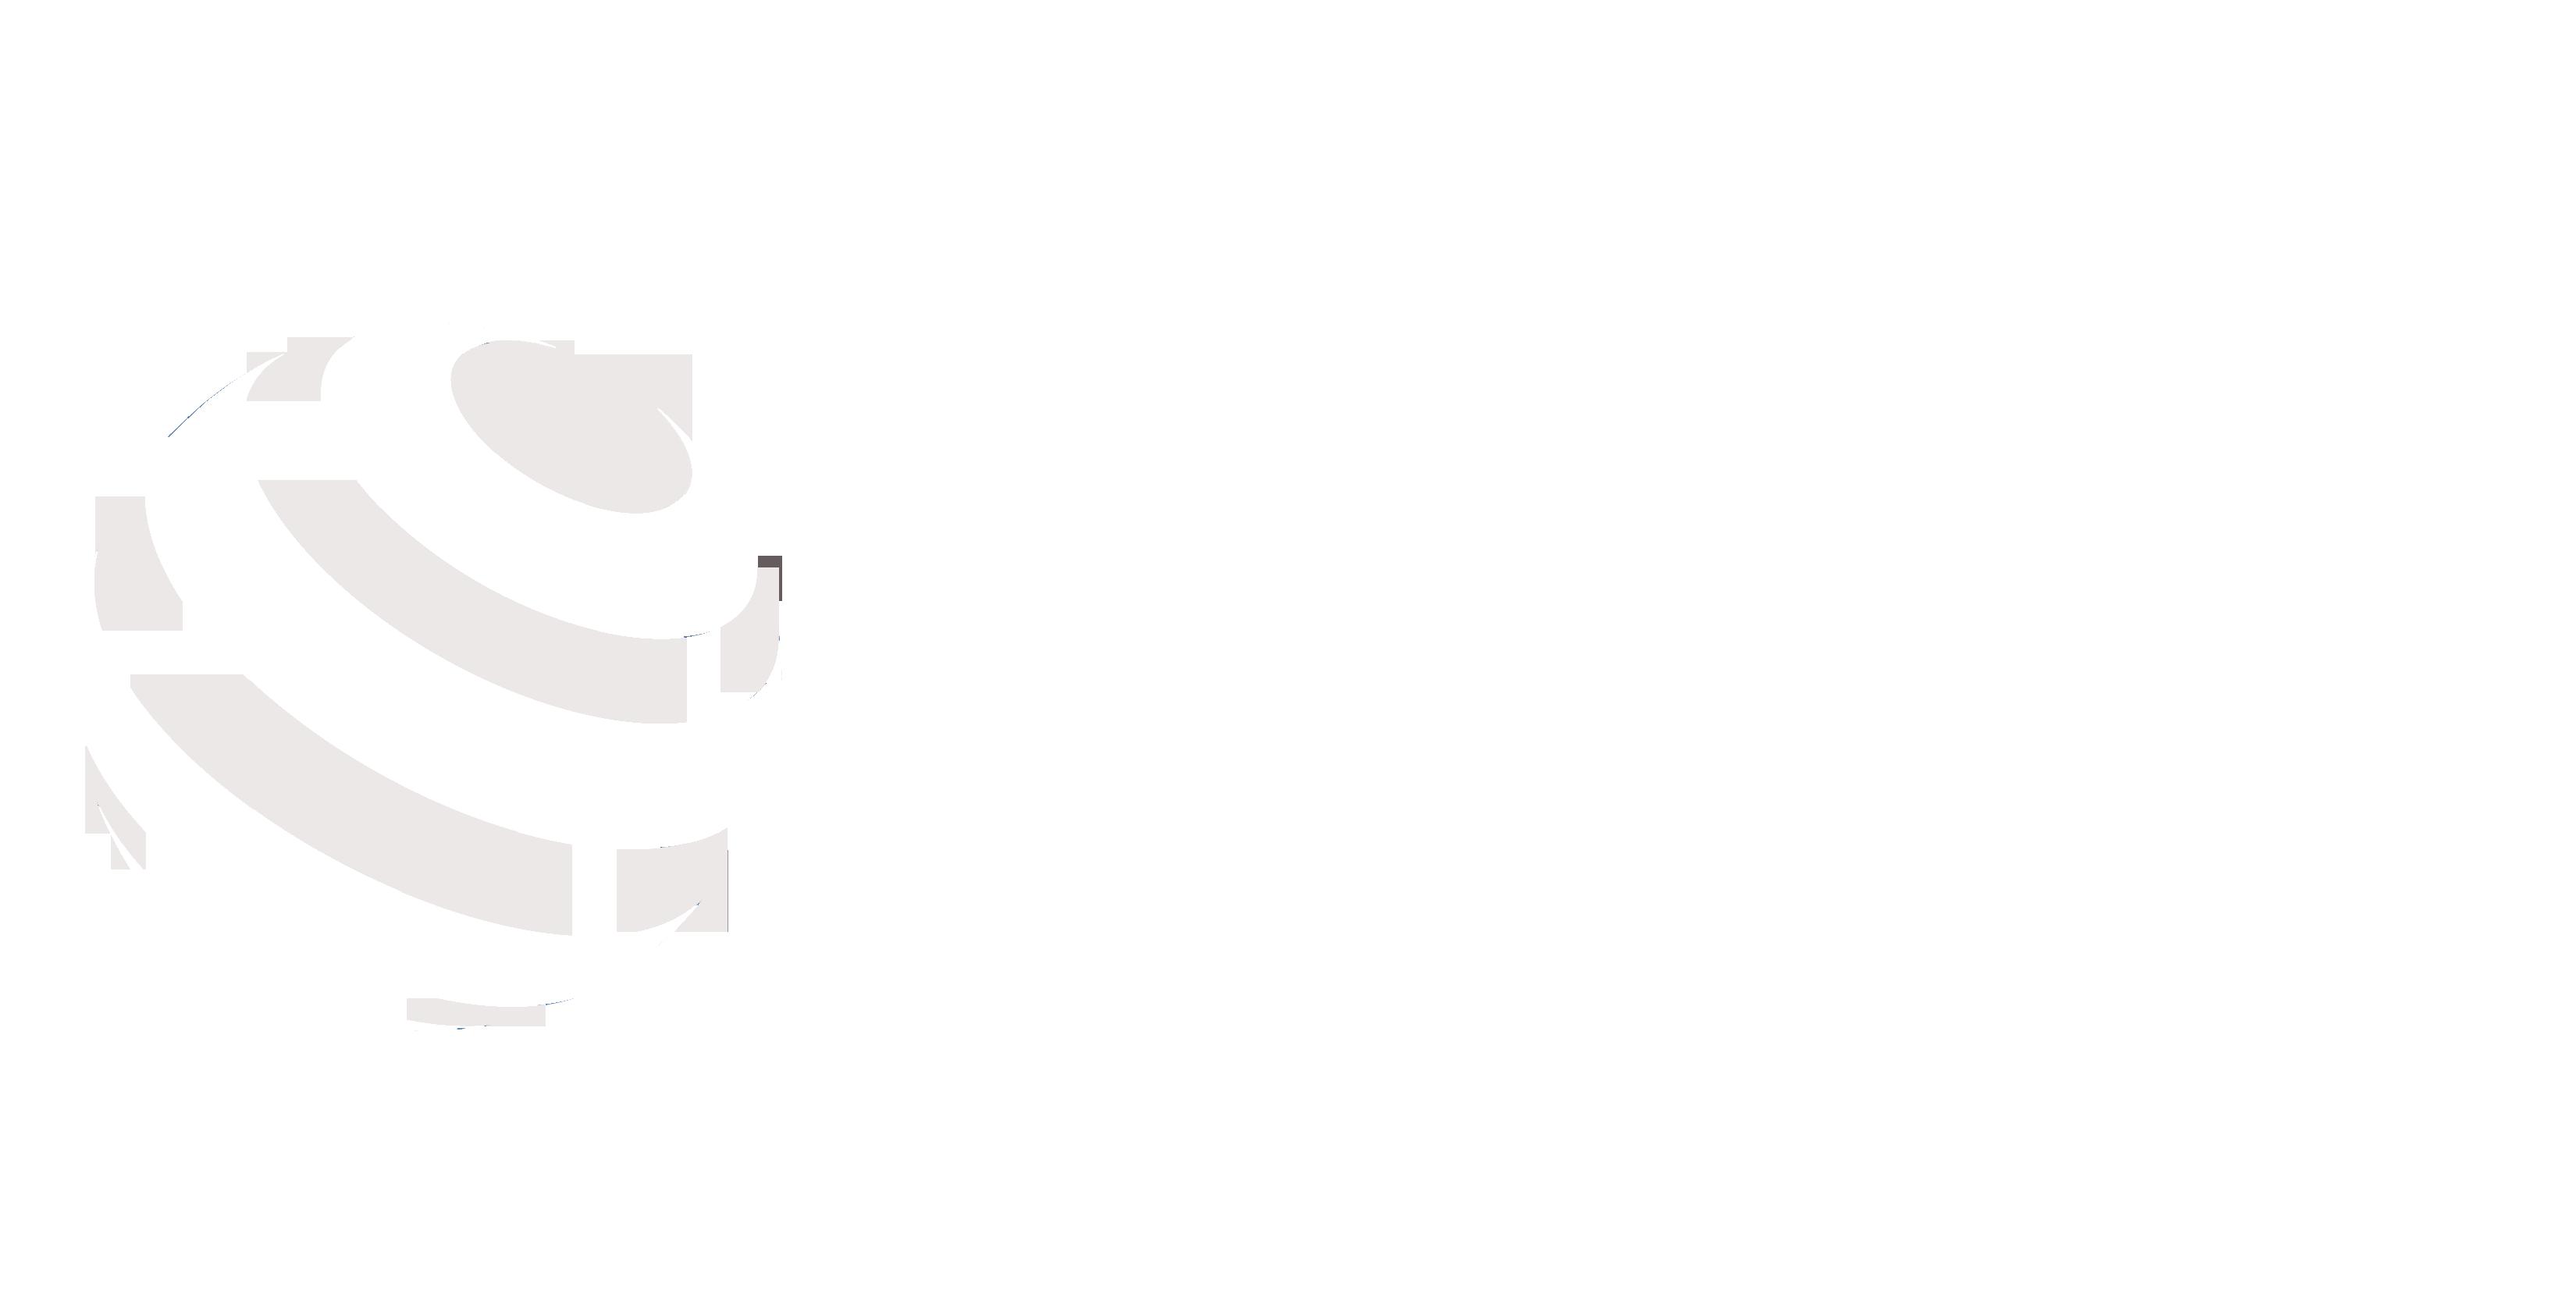 LLS Consultores